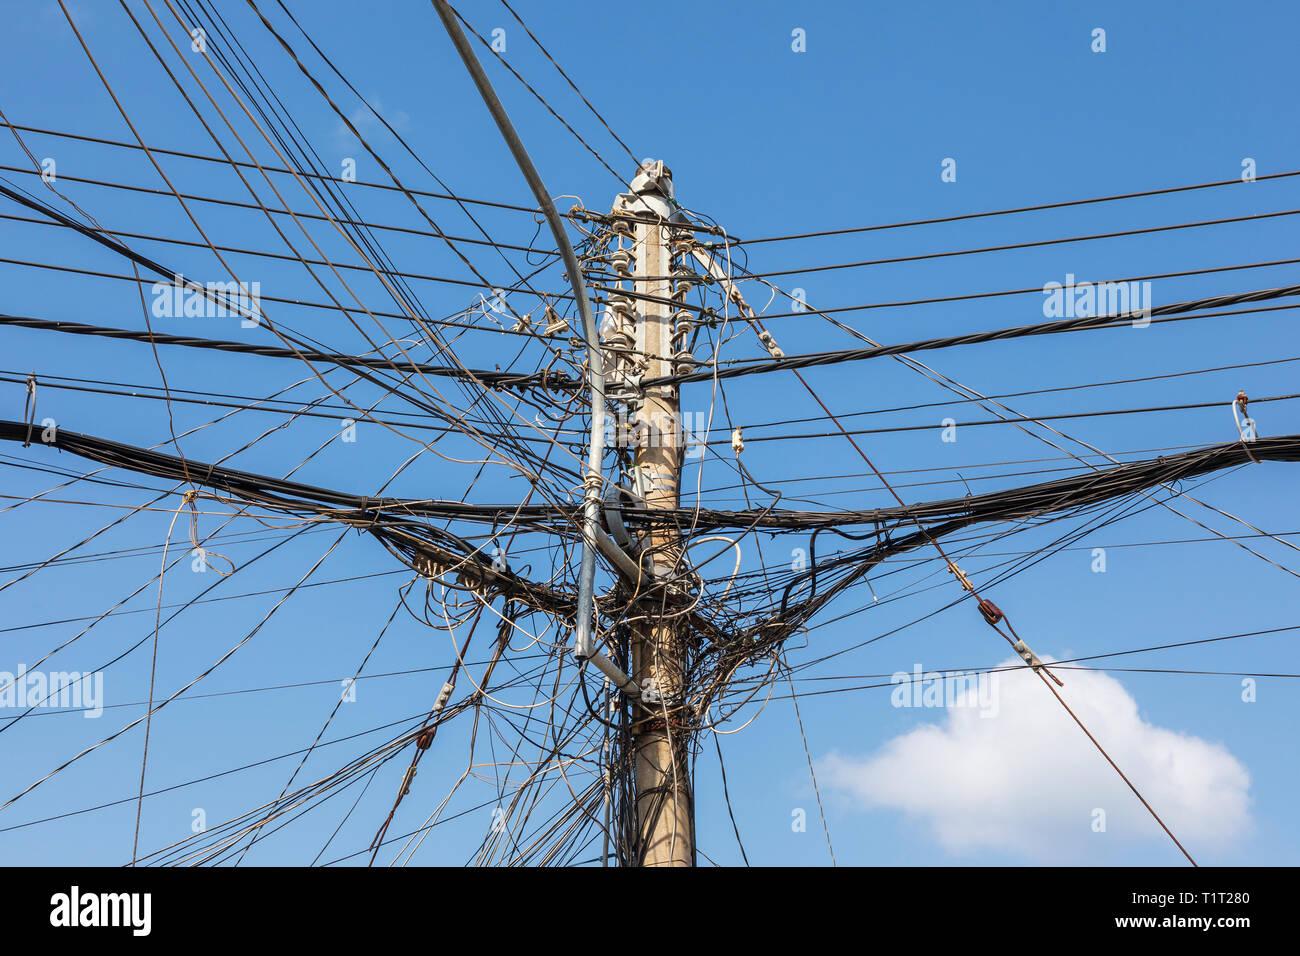 Power cables, Dinh Cau village, Pho Quoc island, Vietnam, Asia Stock Photo